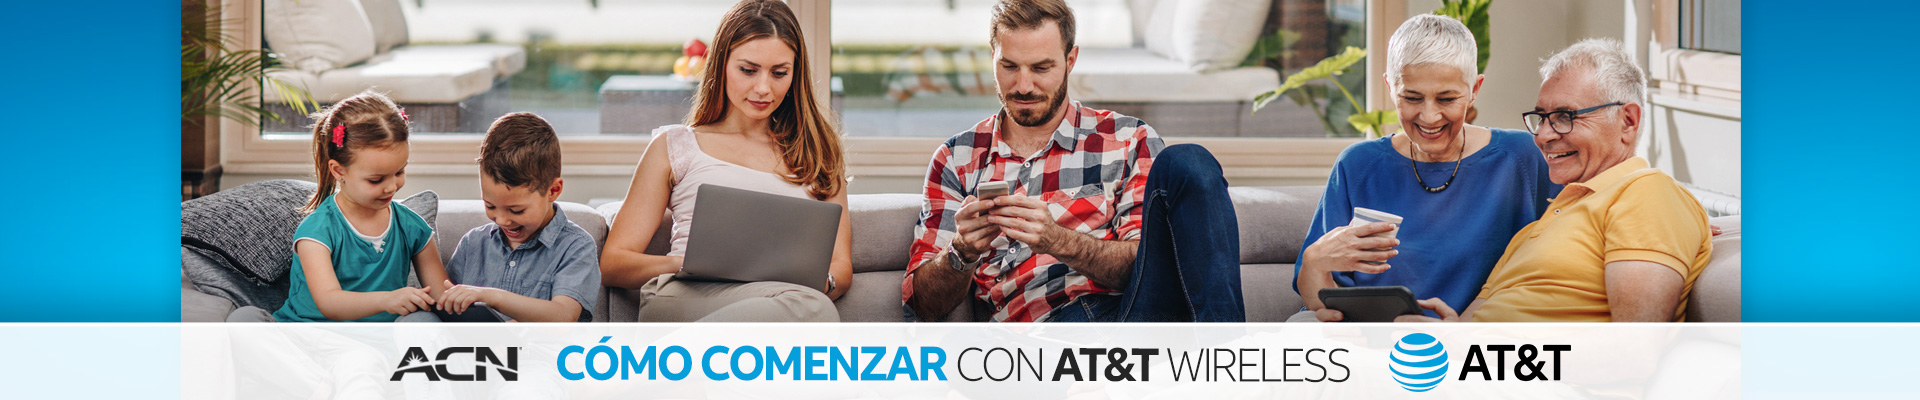 ATT-Wireless_052620_ES_Web